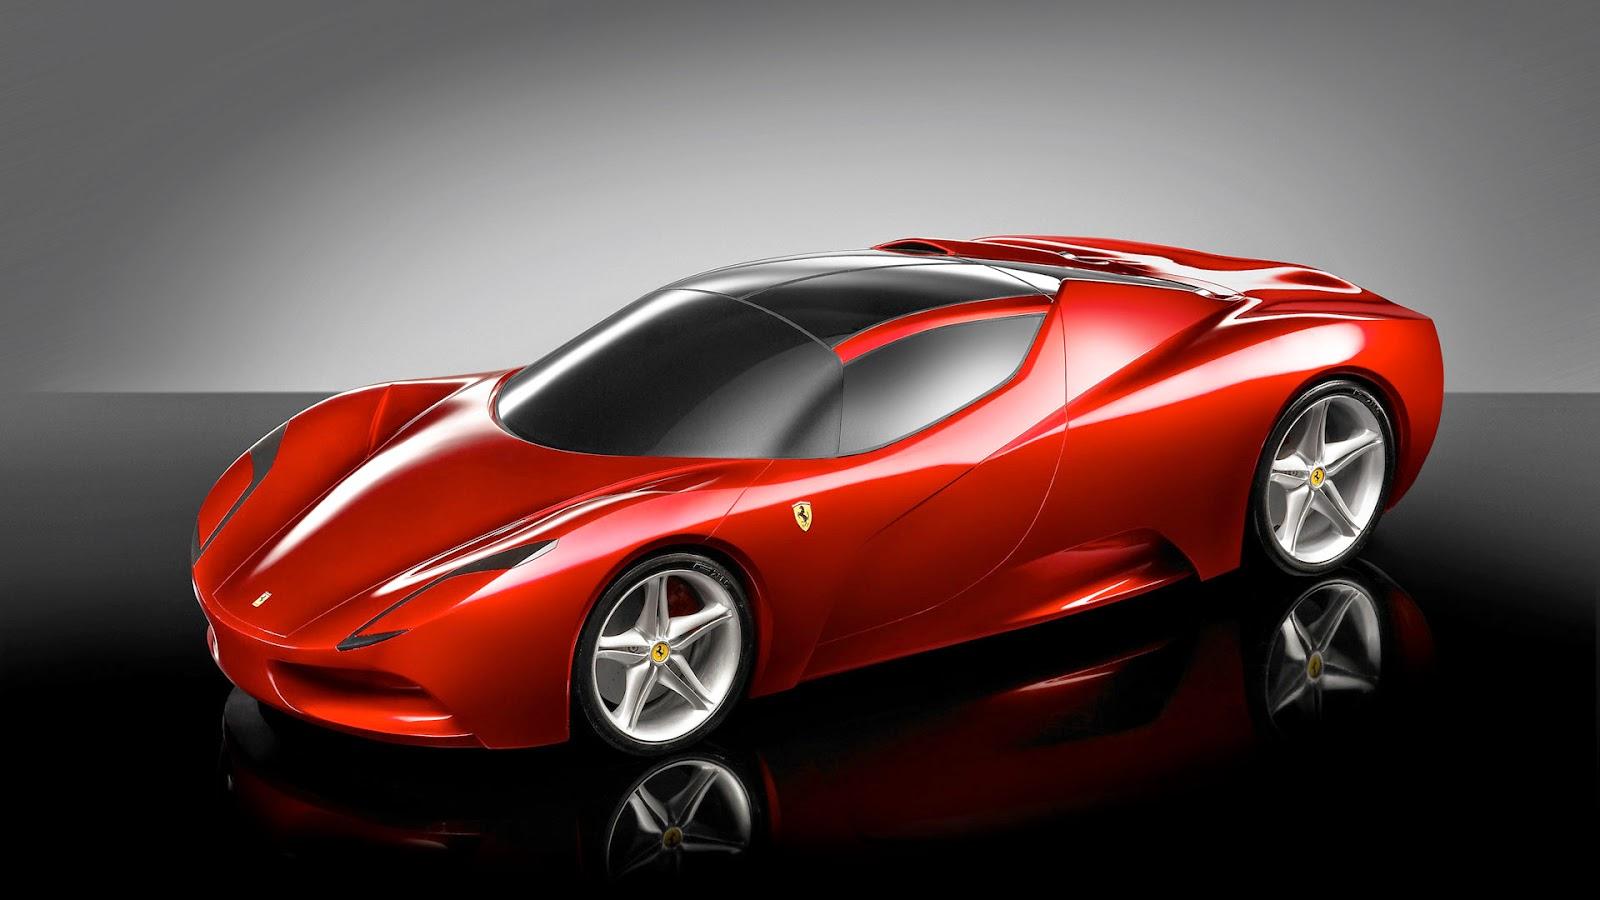 Ferrari car high resolution pictures